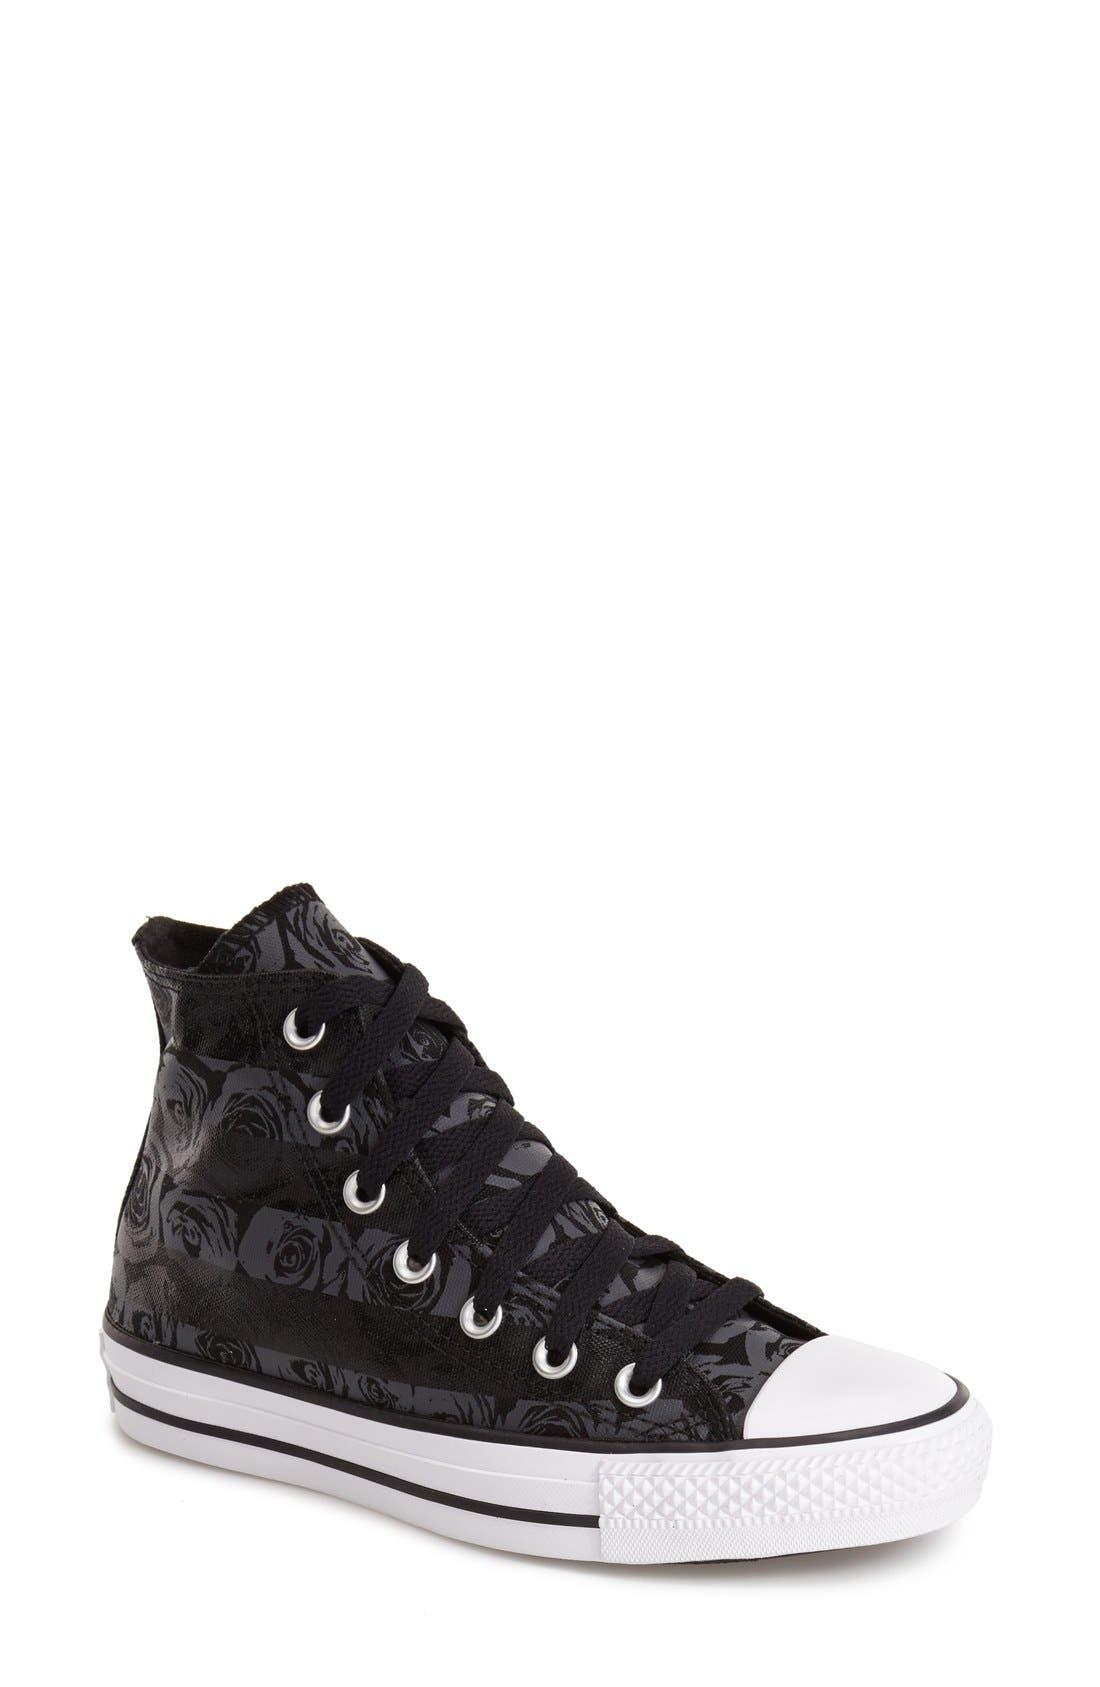 Alternate Image 1 Selected - Converse Chuck Taylor® All Star® Rose Print High Top Sneaker (Women)